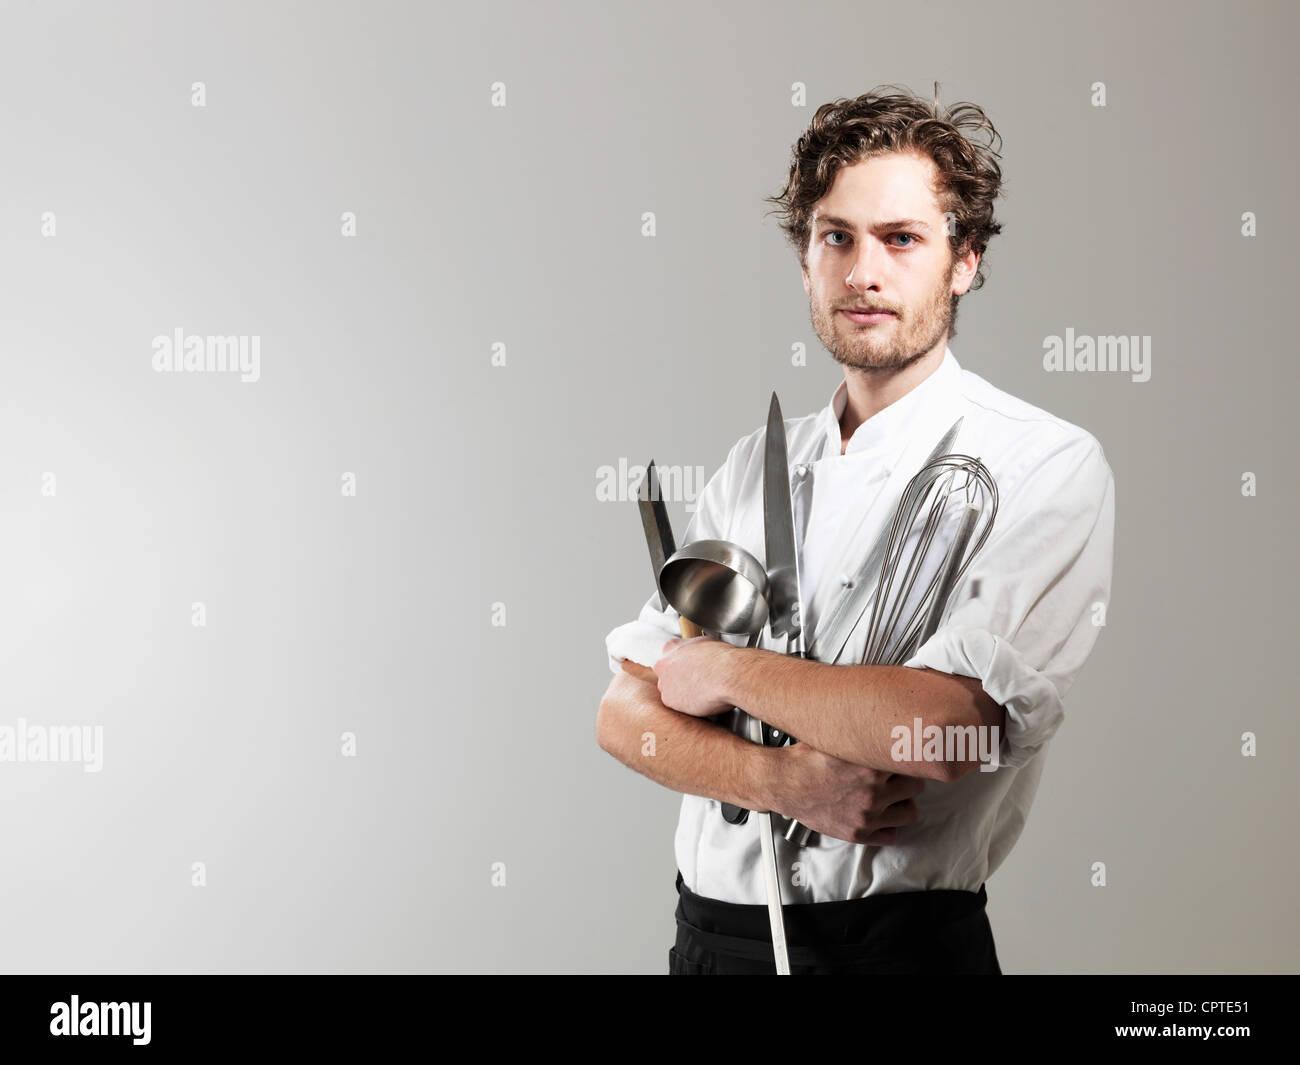 Chef holding kitchen utensils against white background - Stock Image